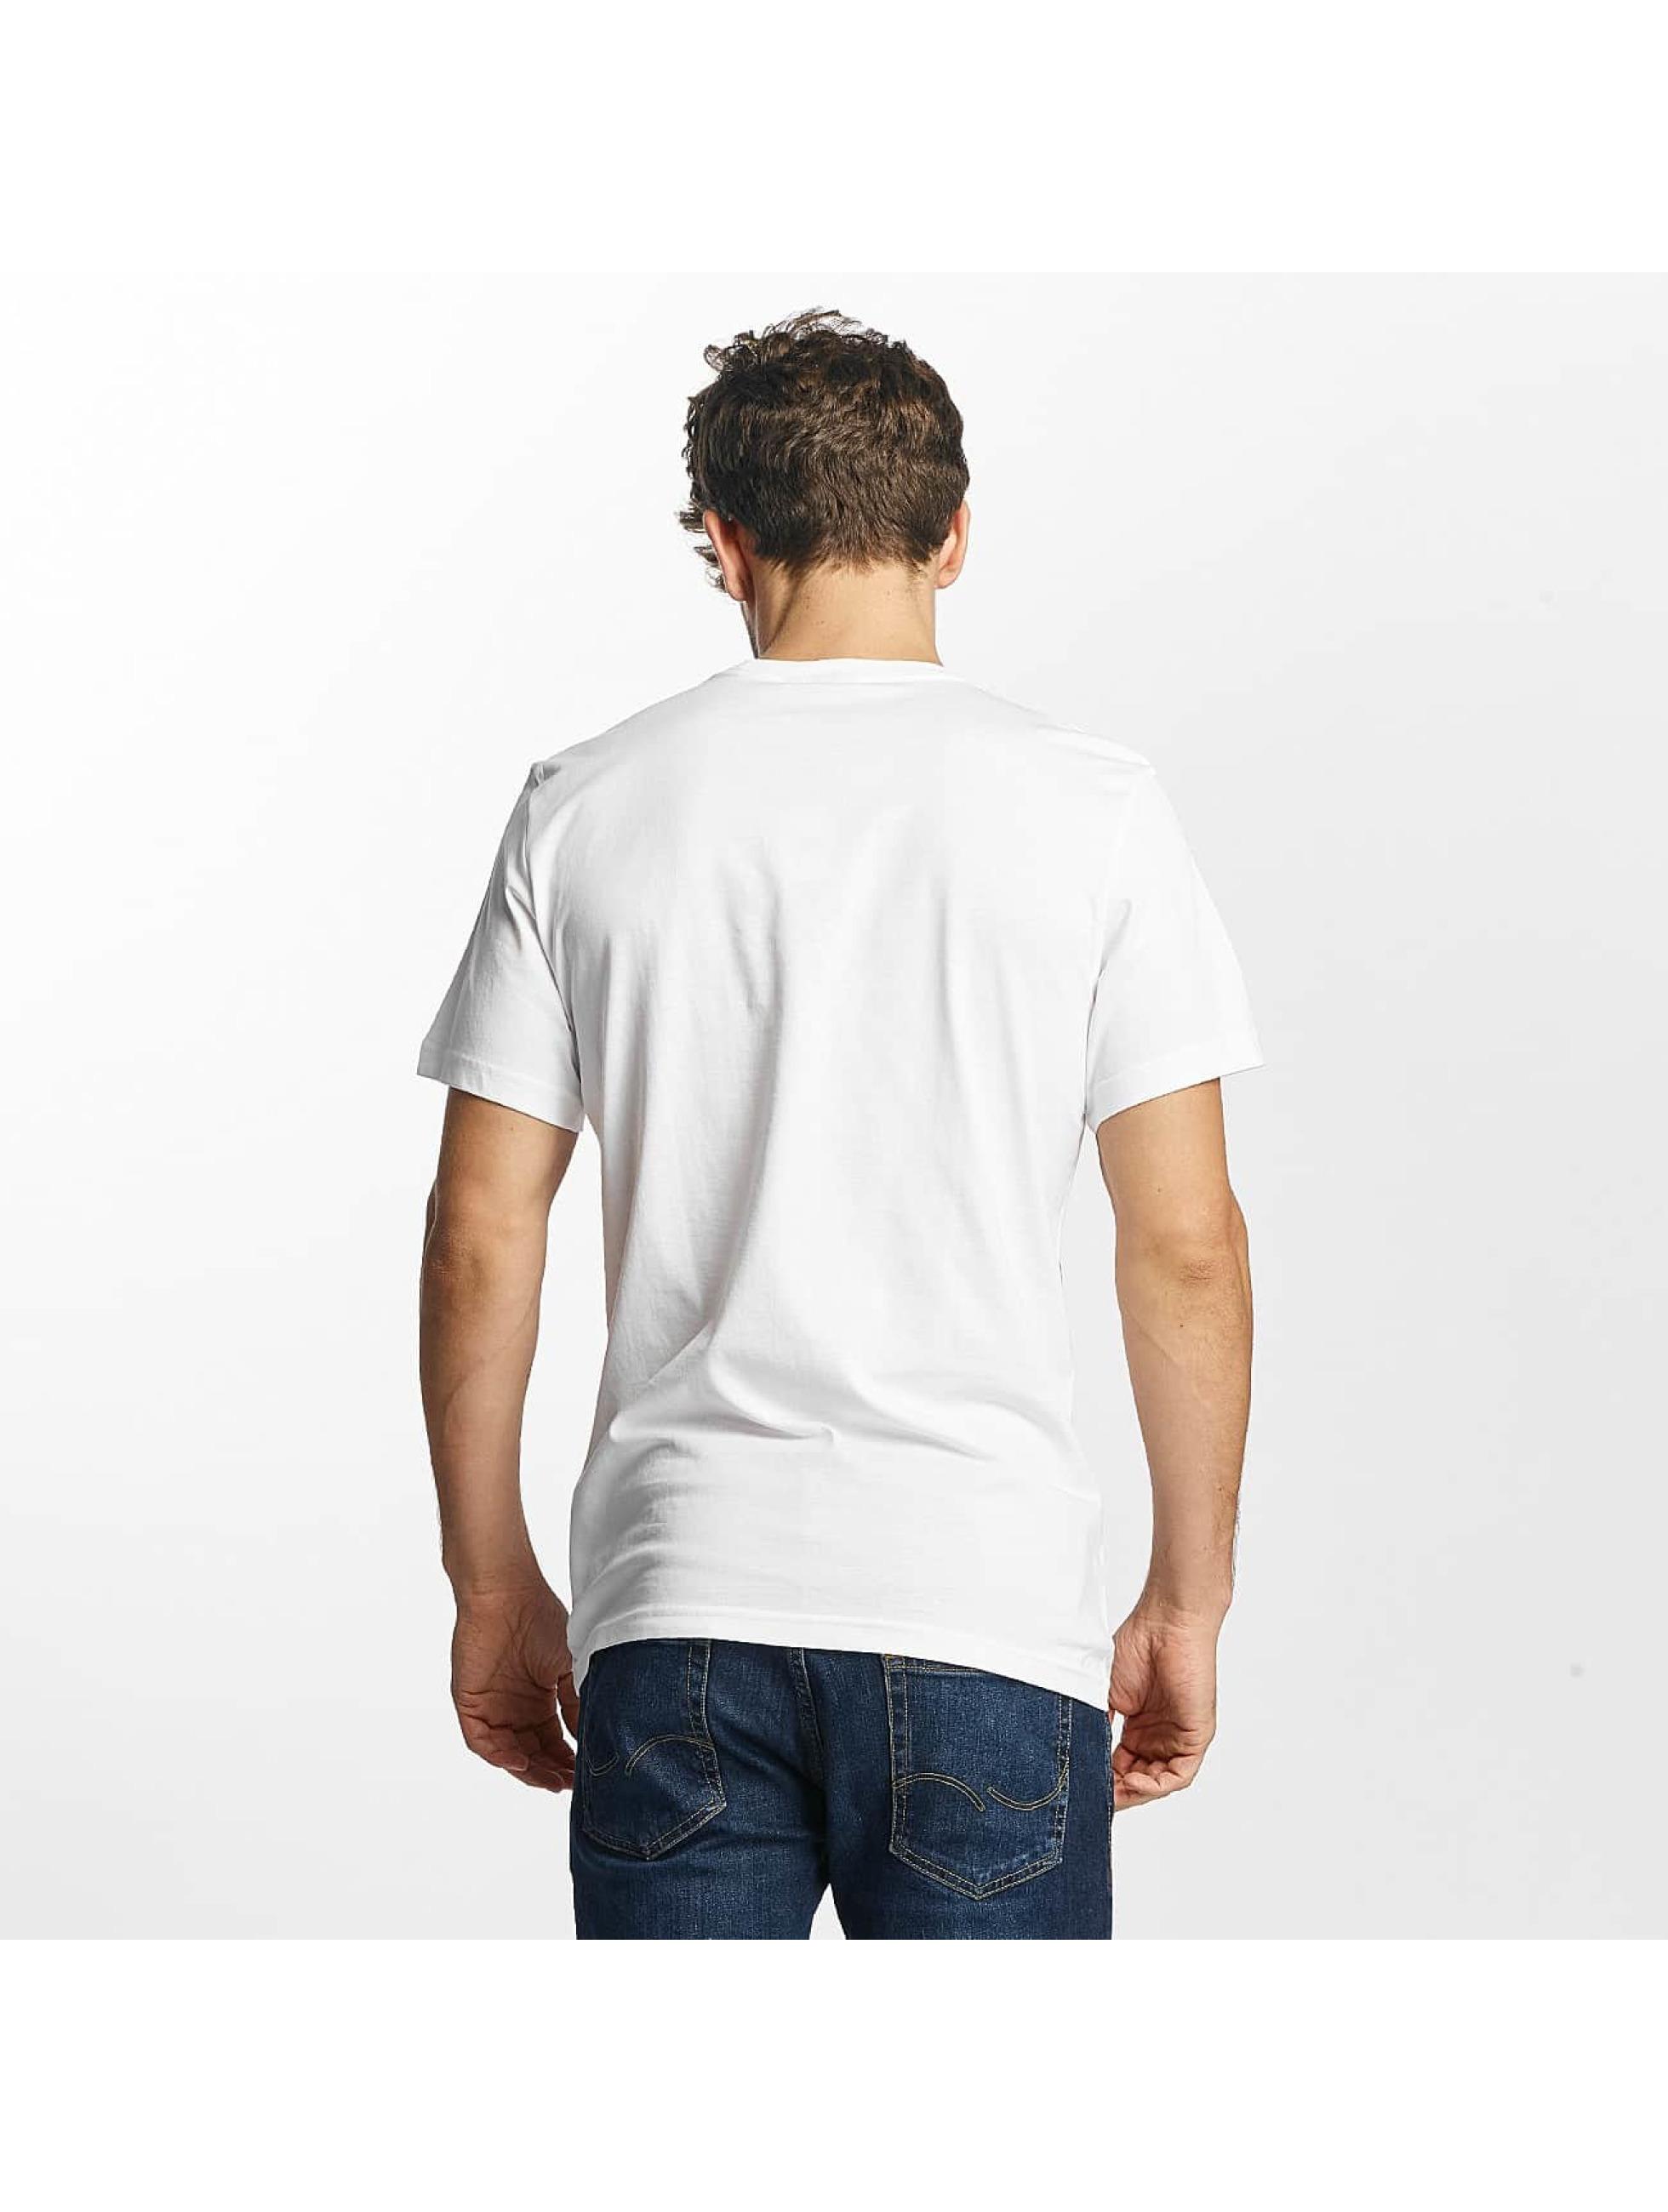 adidas T-Shirt Photo 1 white